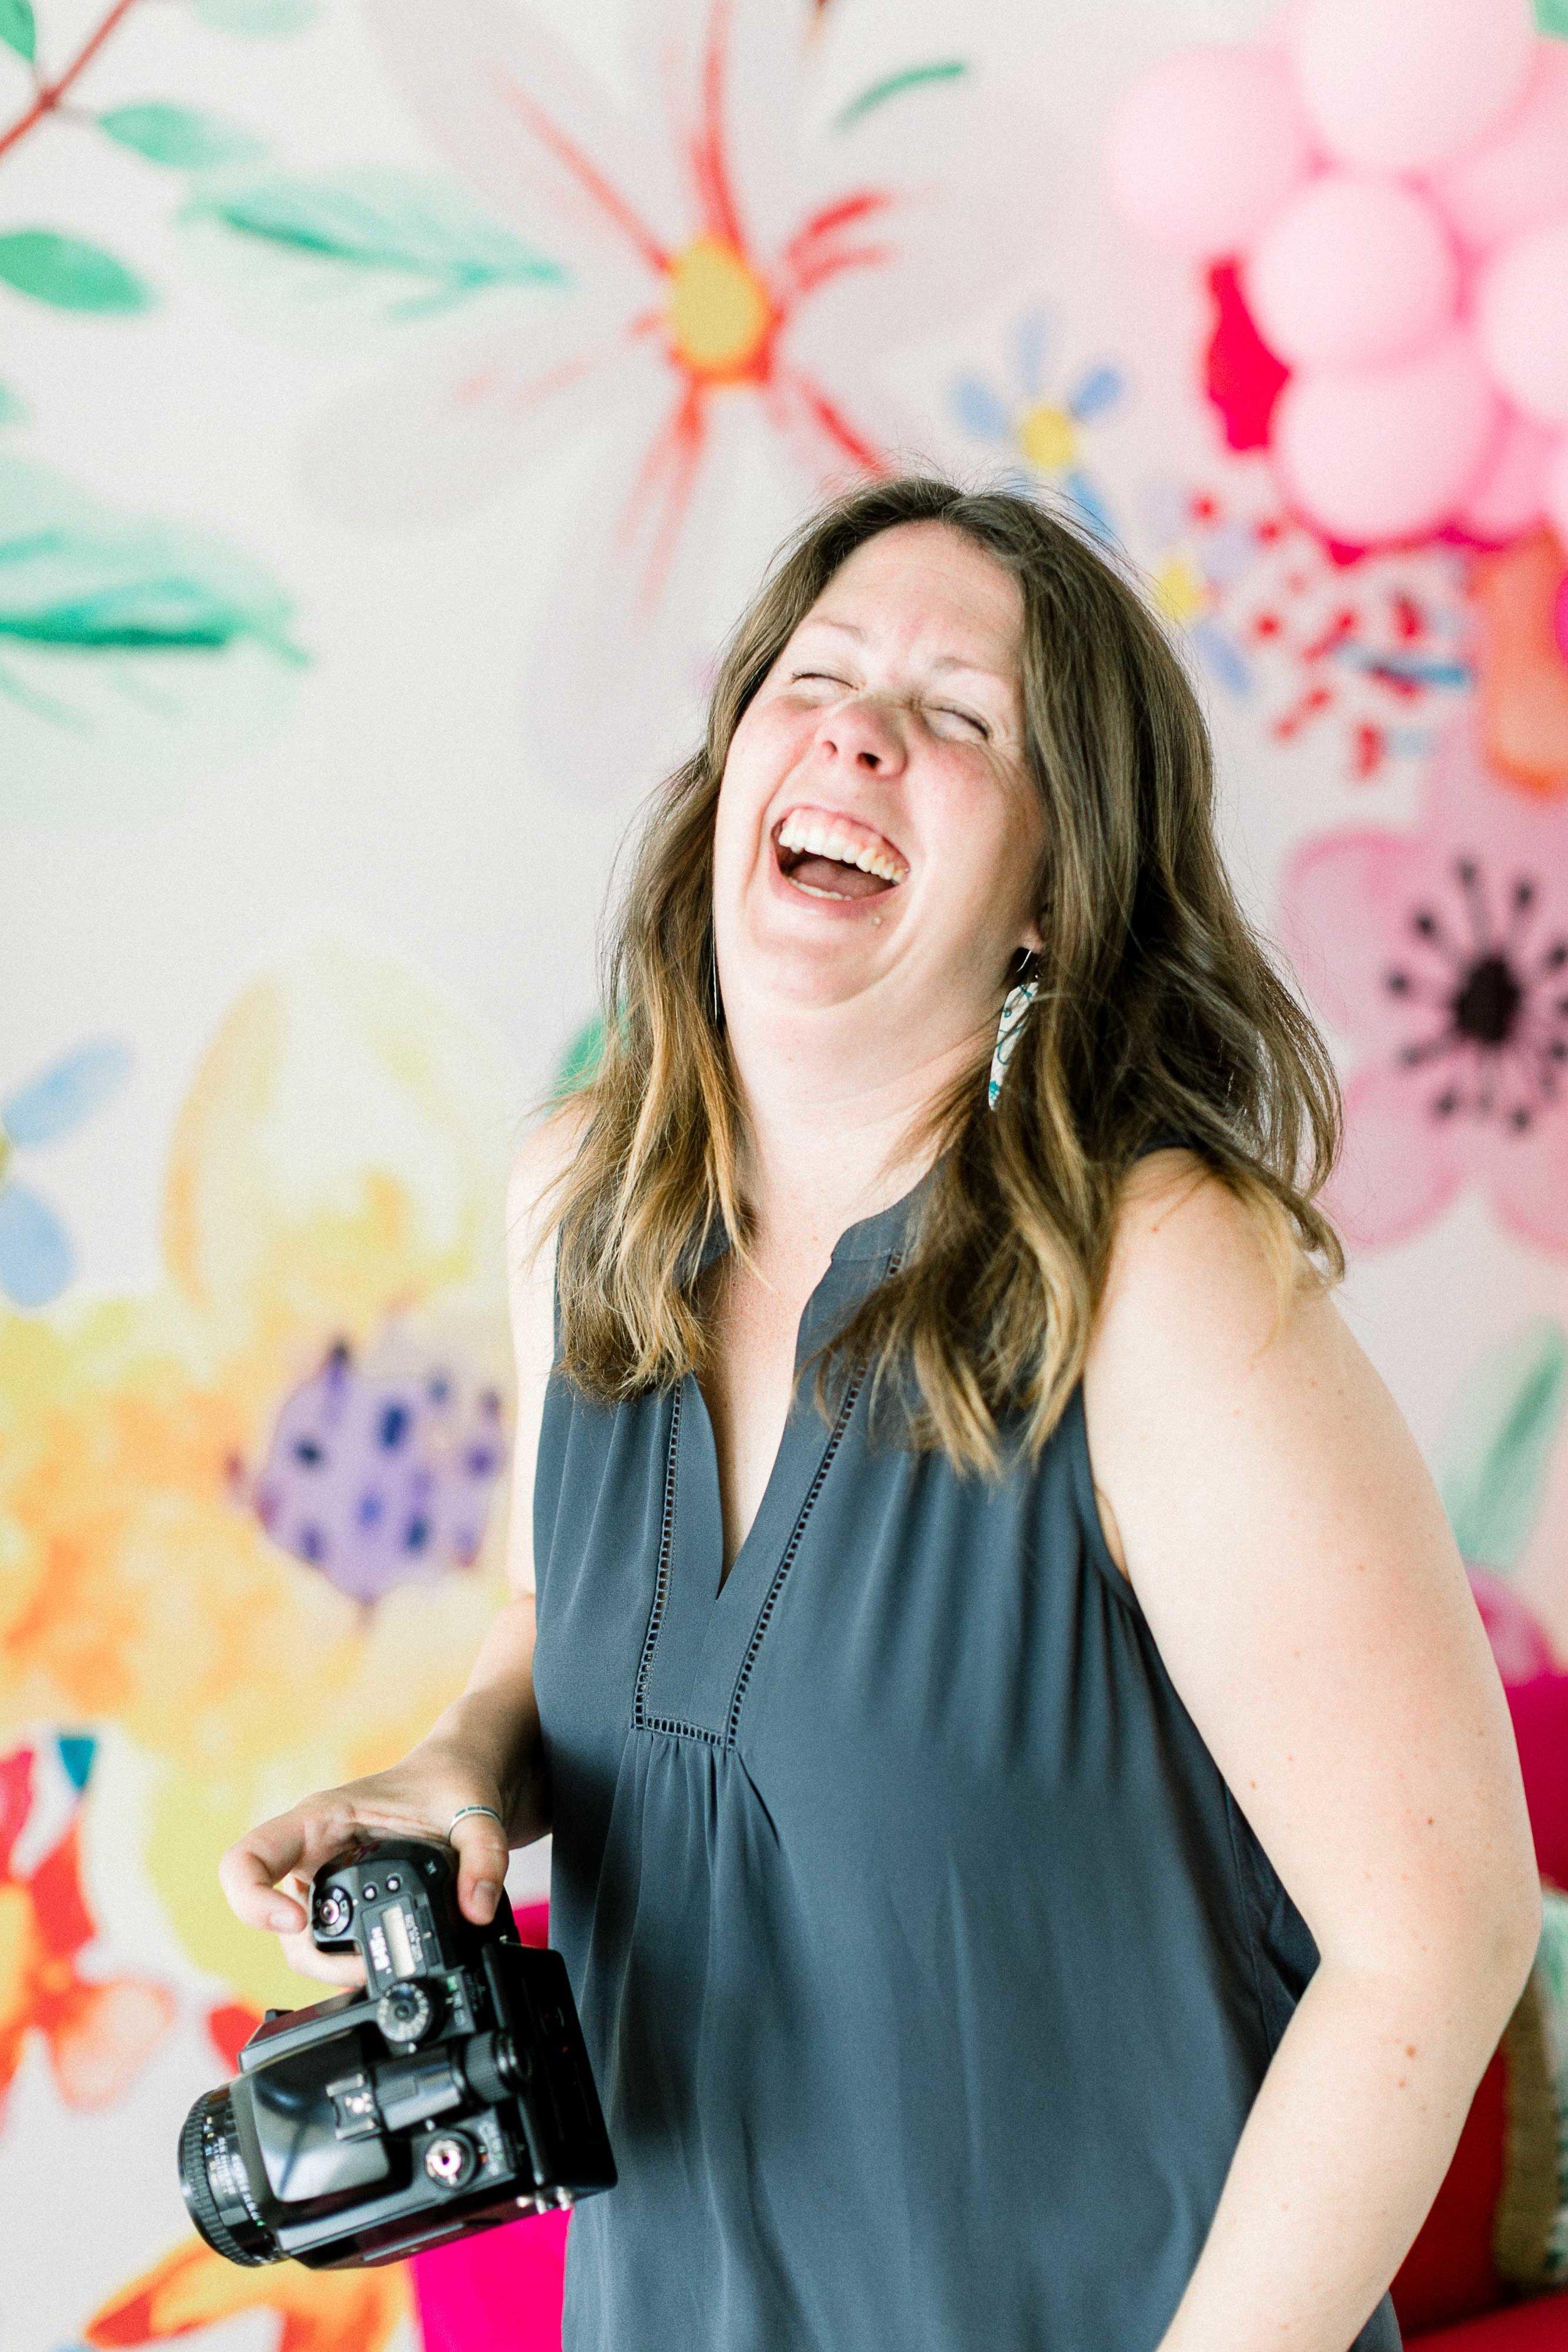 Sonja-Salzburg-SonjaKPhotography-Oregon-Colorado-Elopement-Portrait-LGBTQ-Wedding-Family-Photographer.jpg